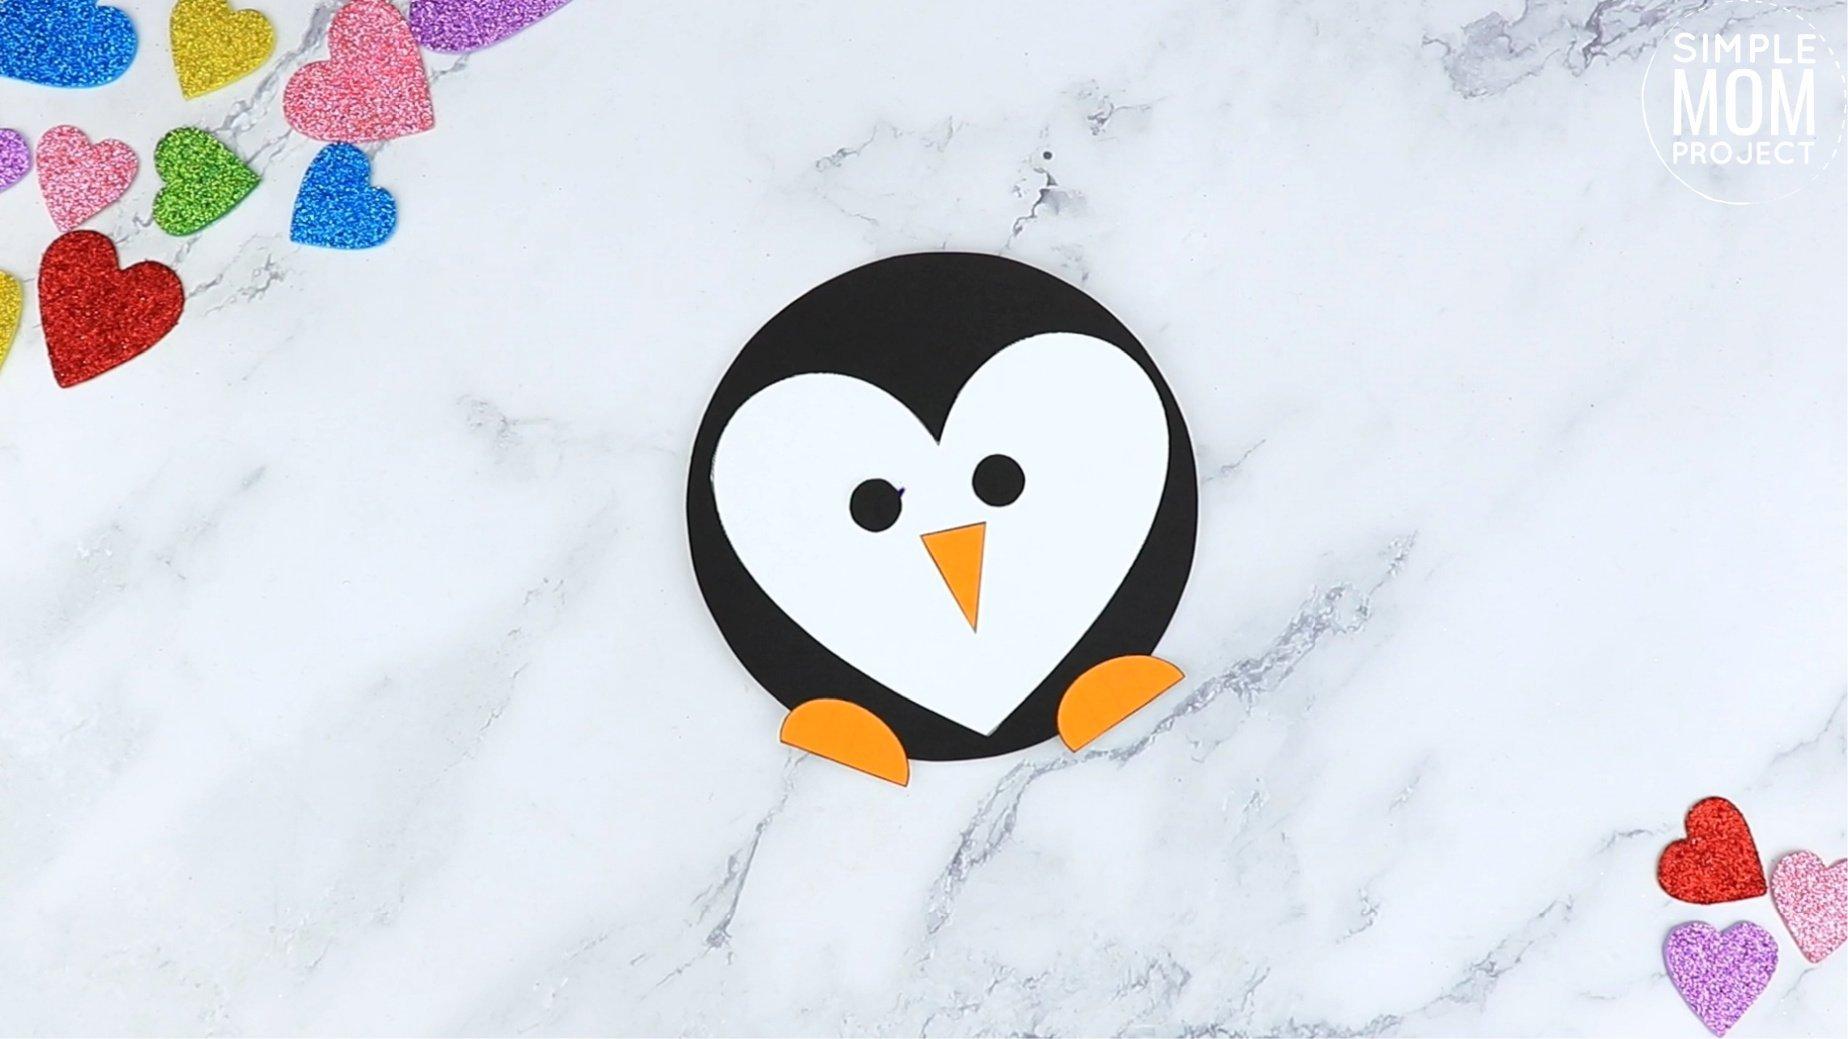 Easy Printable Diy Heart Penguin Craft for Preschool, toddler, kindergarten